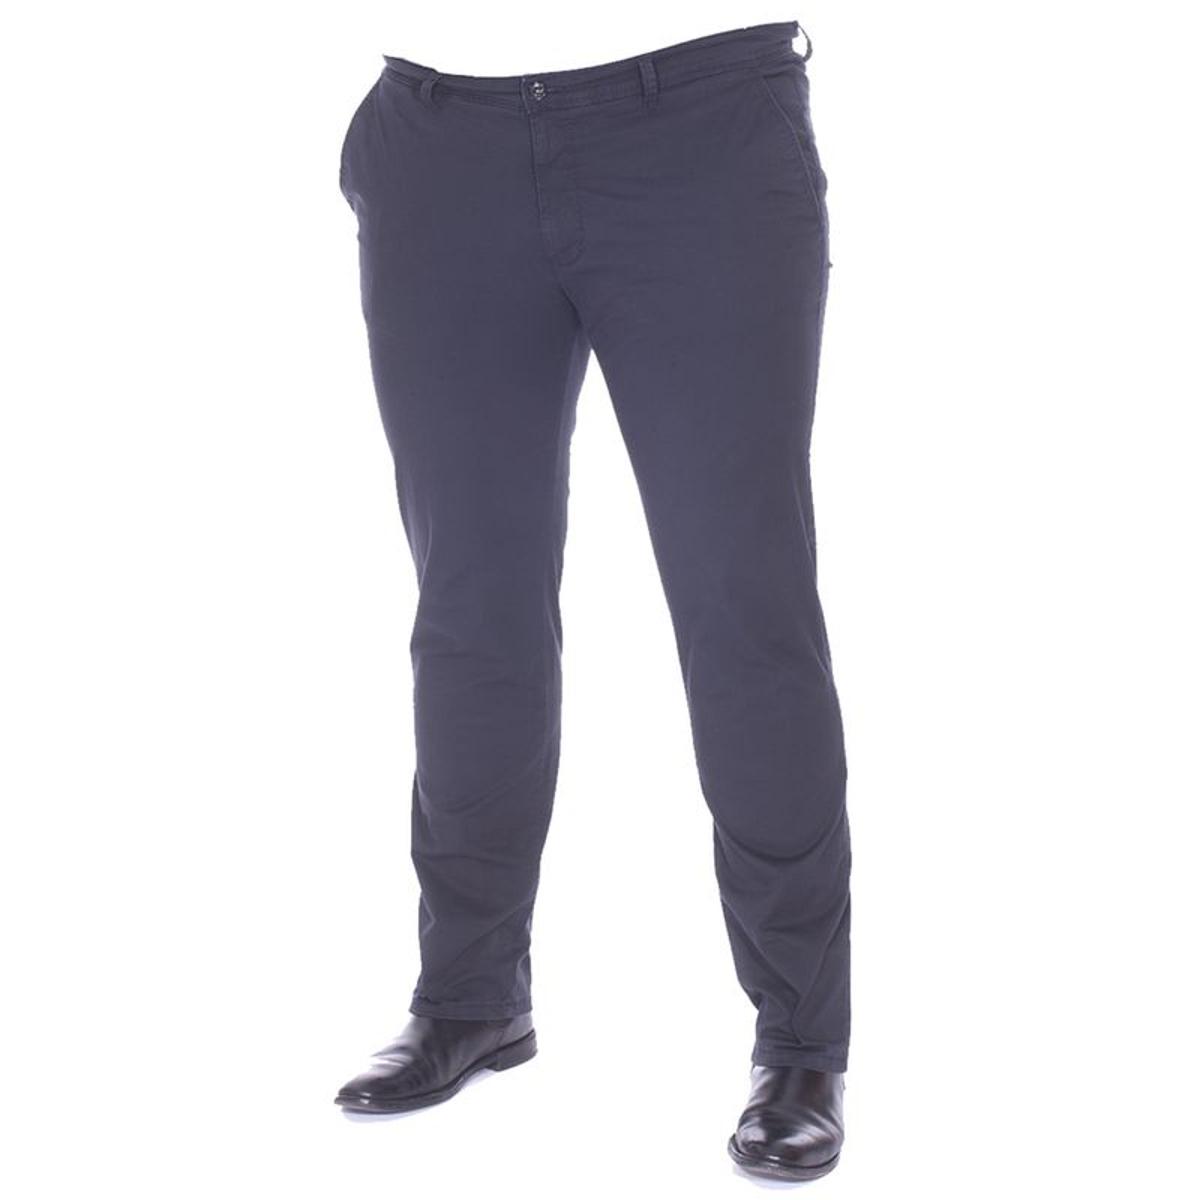 Pantalons homme grande taille Coton, Elasthane